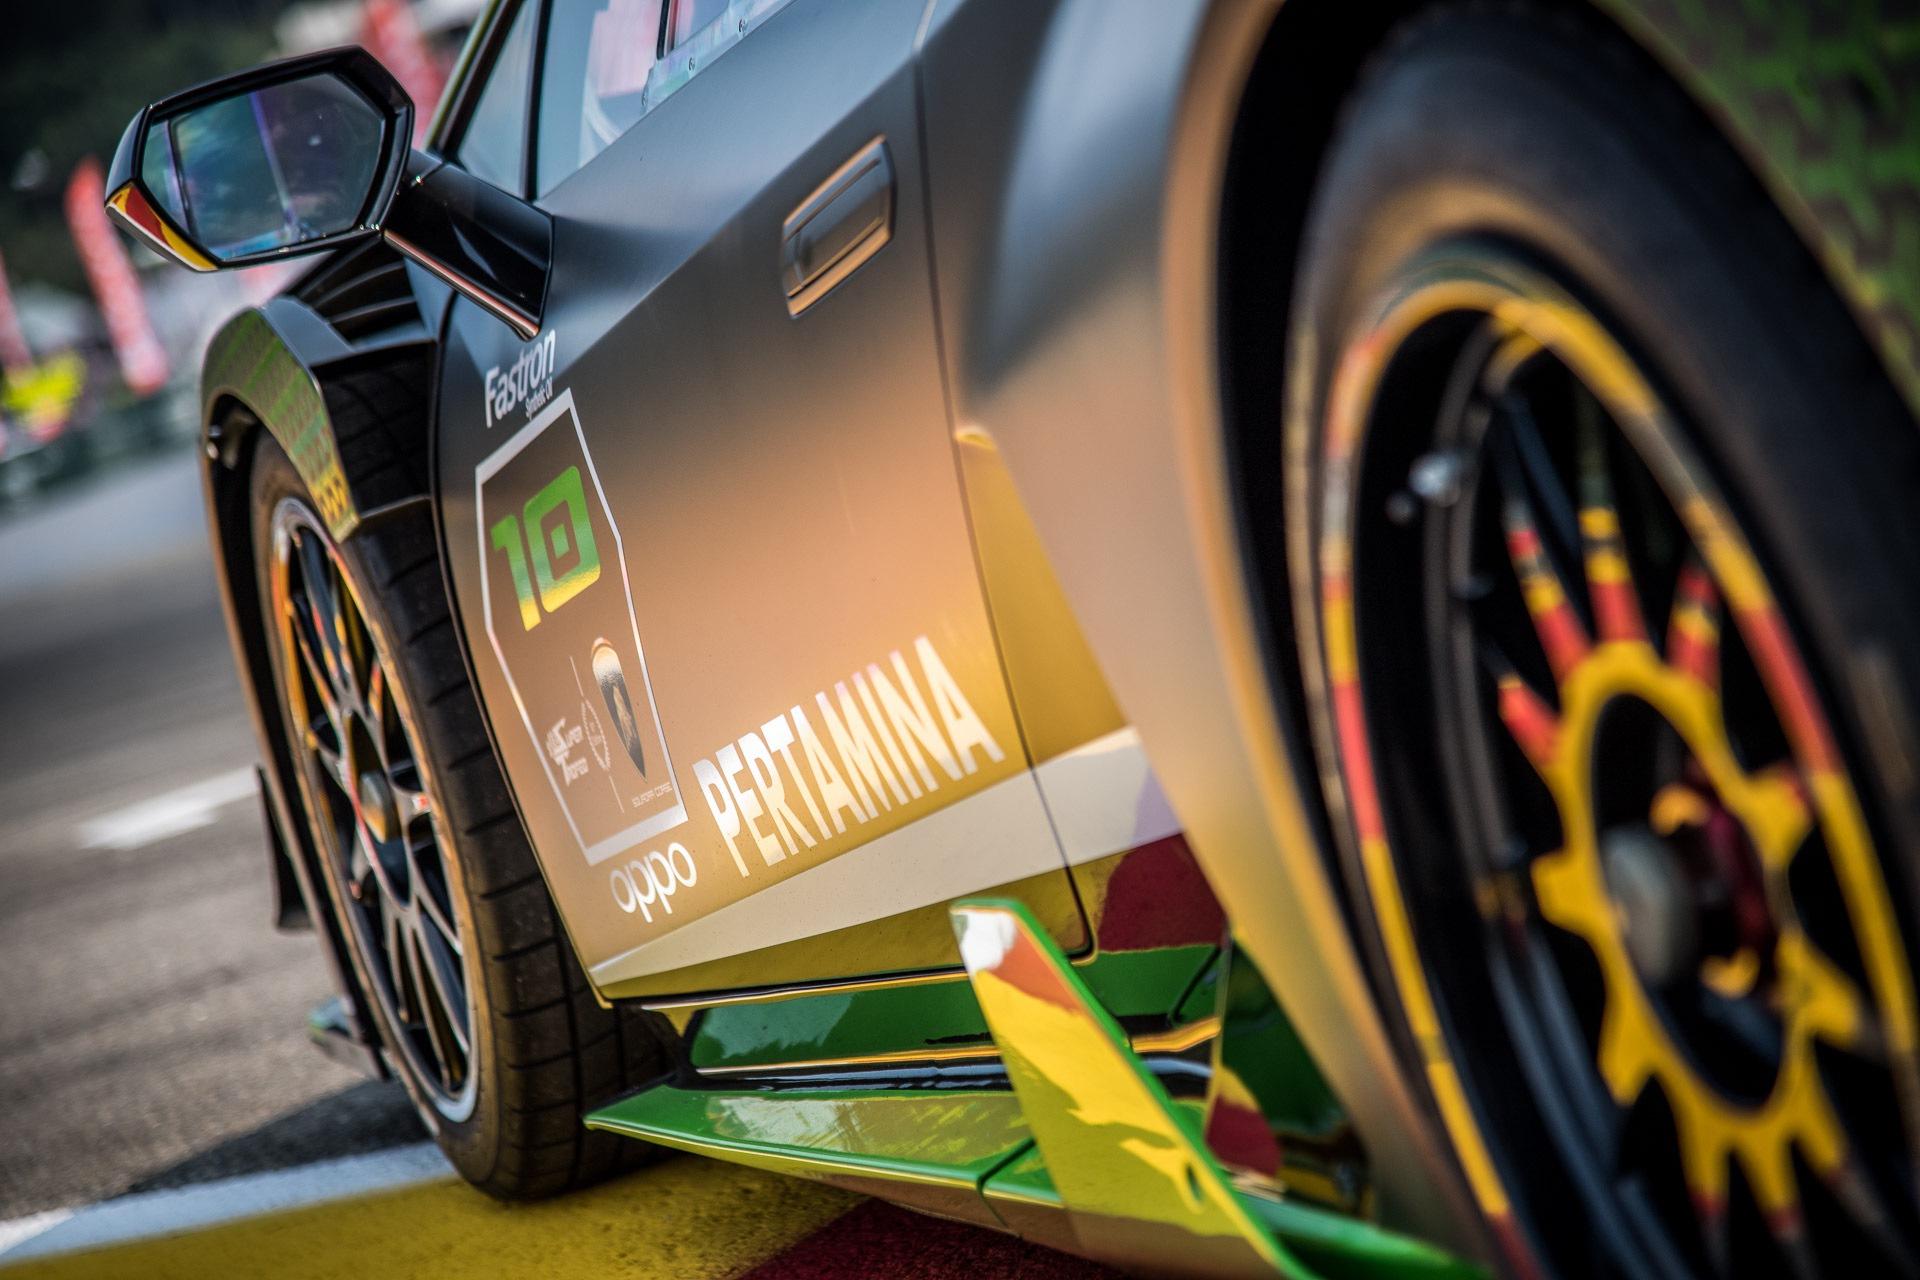 Lamborghini_Huracan_Super_Trofeo_Evo_10th_Edition_0002